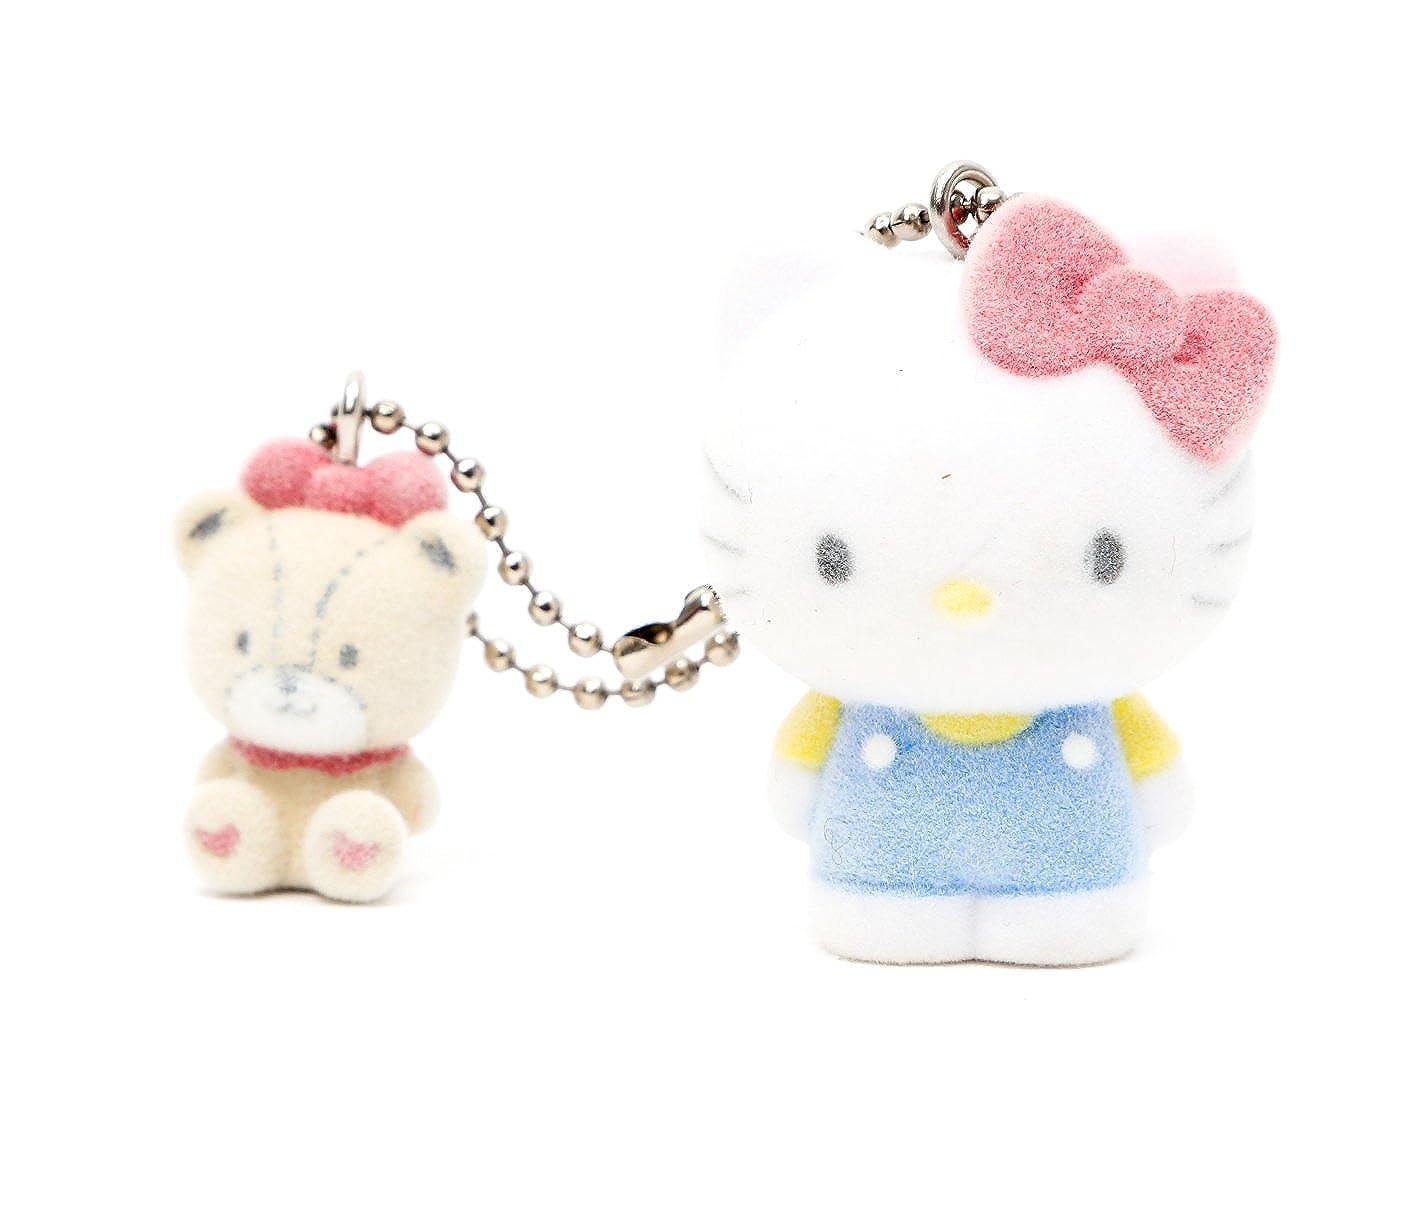 Amazon.com  Sanrio Hello Kitty Keychain - Flocked - Featuring Tiny Chum   Shoes 69c0b9f11f31